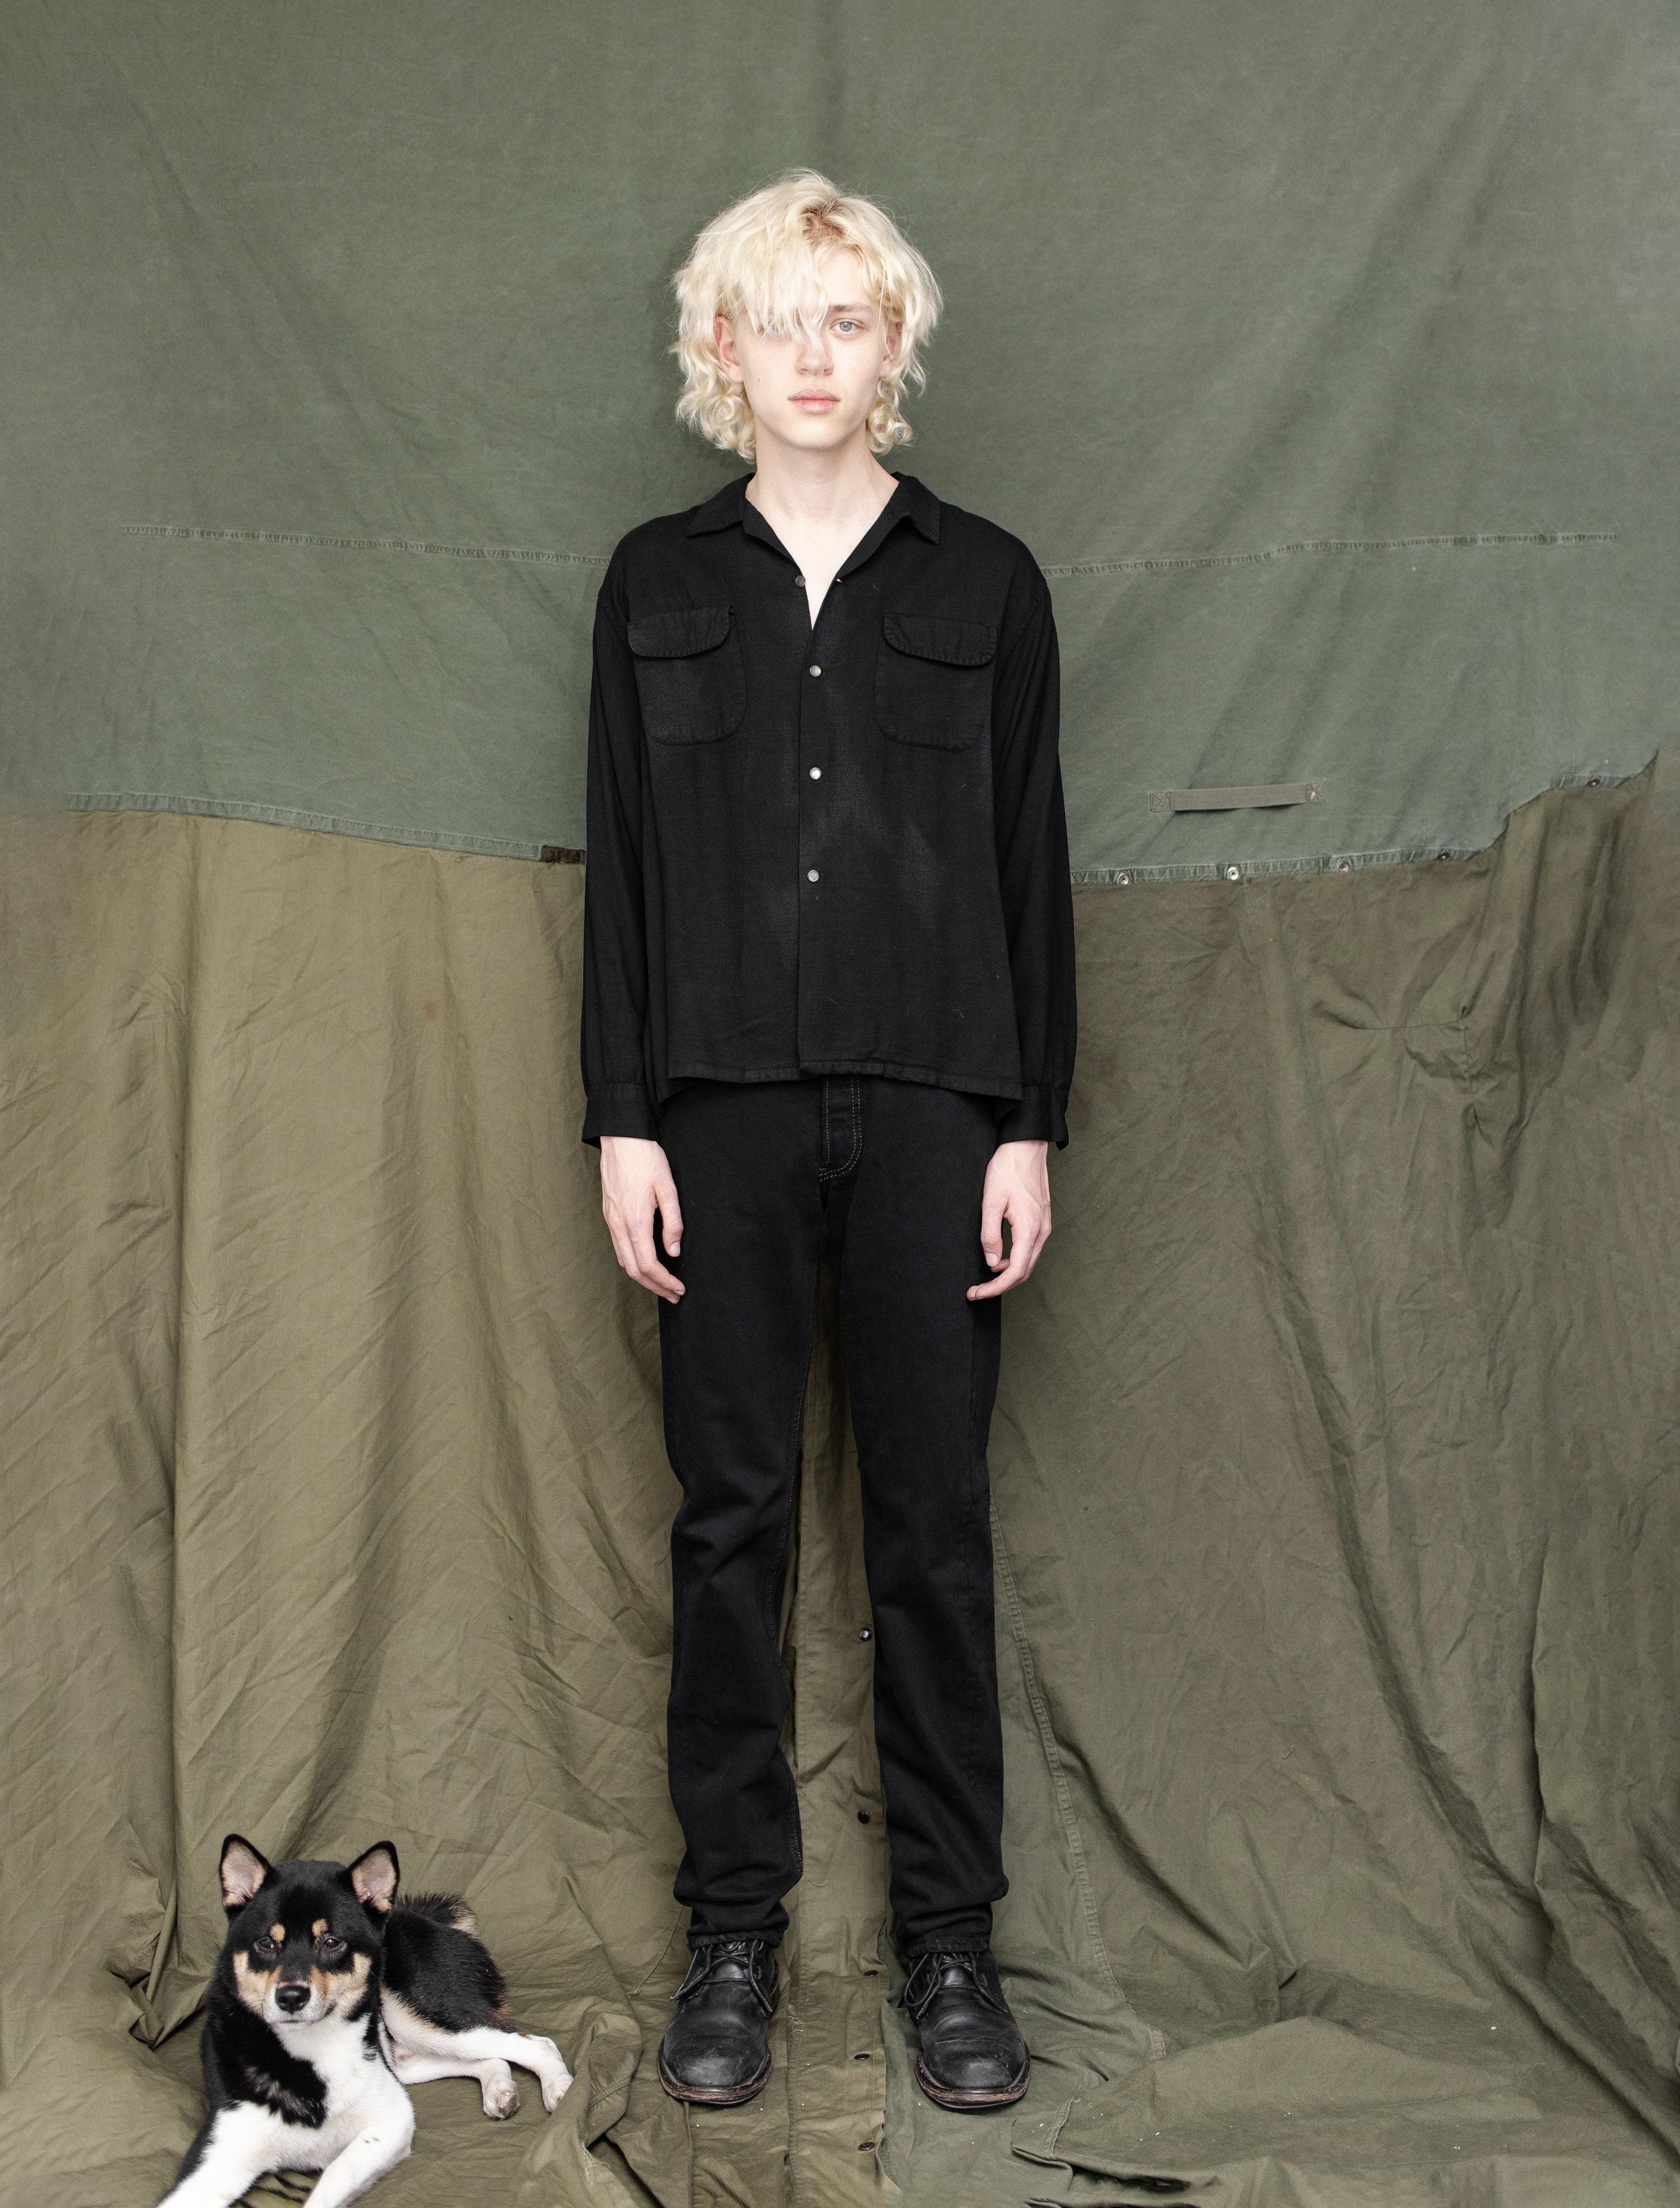 50's Gabardine Loop Collar Shirt 80's Levi's 501 Jeans